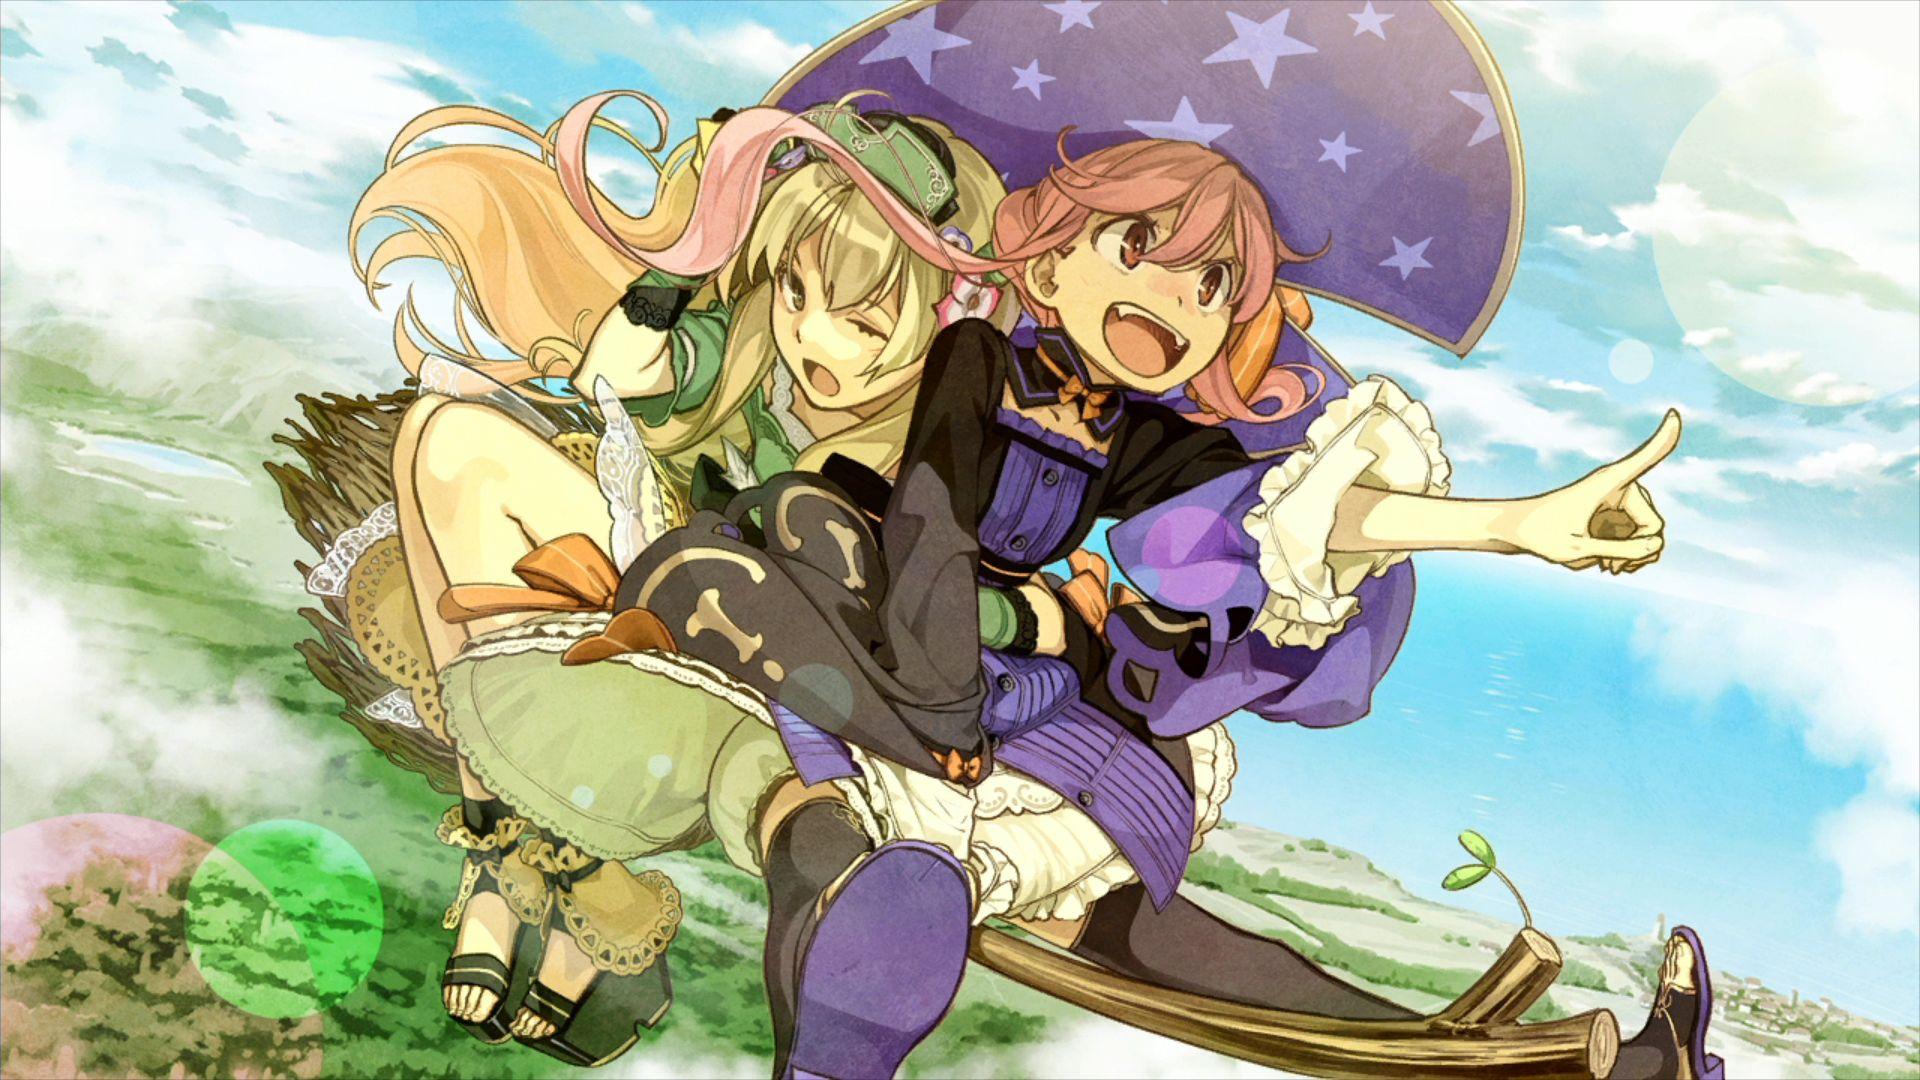 Persona 4 Golden VPK download PS Vita (English and Undub